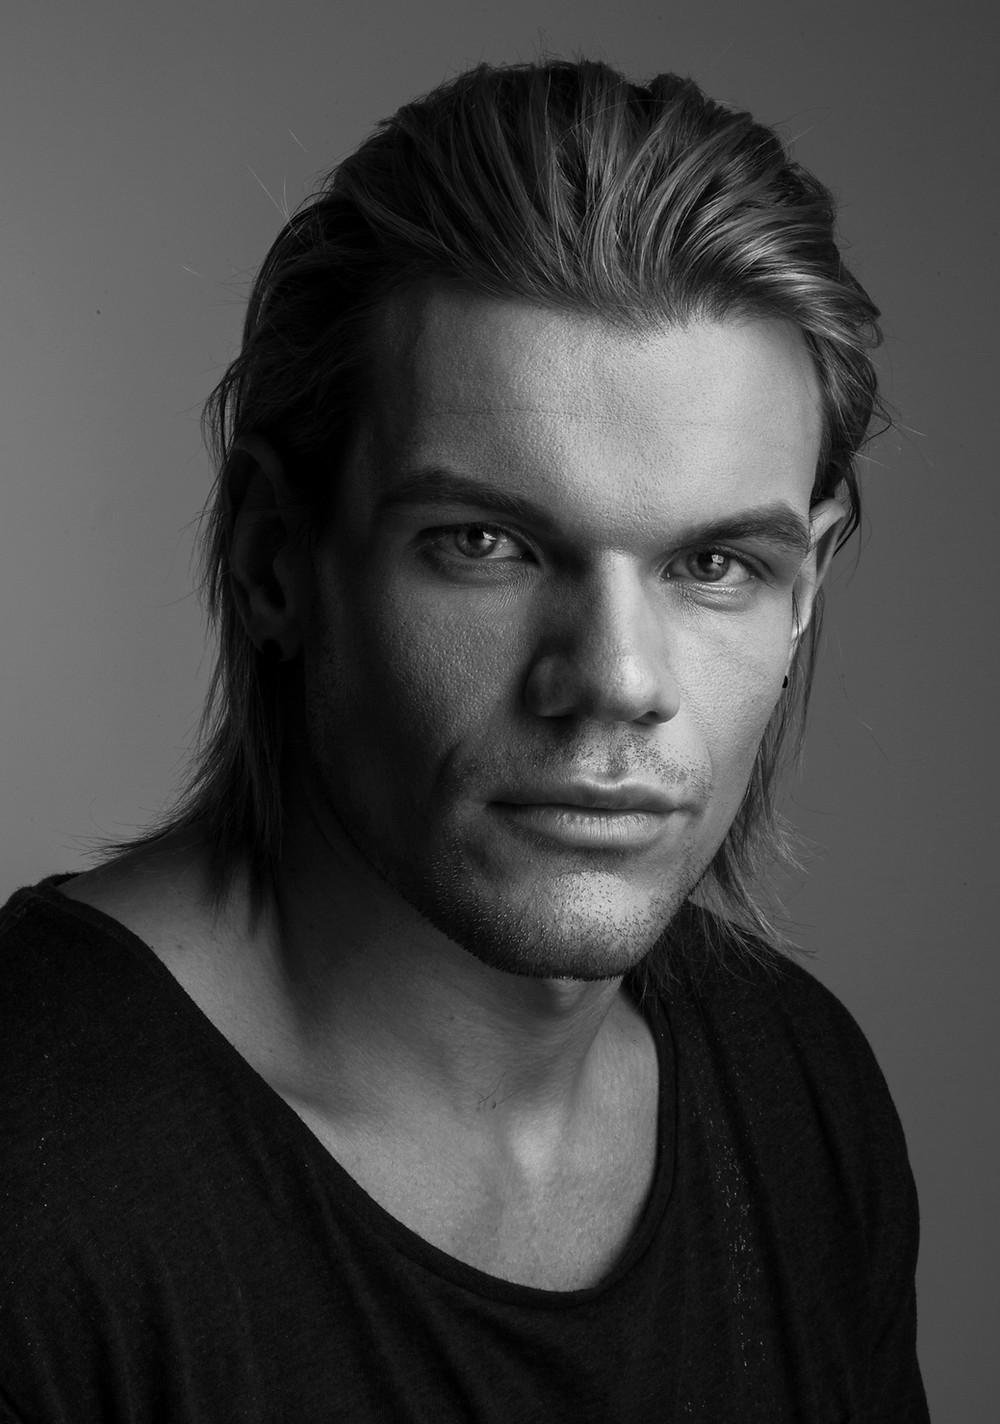 Garcia Morales - Actor Portrait Photographer in London